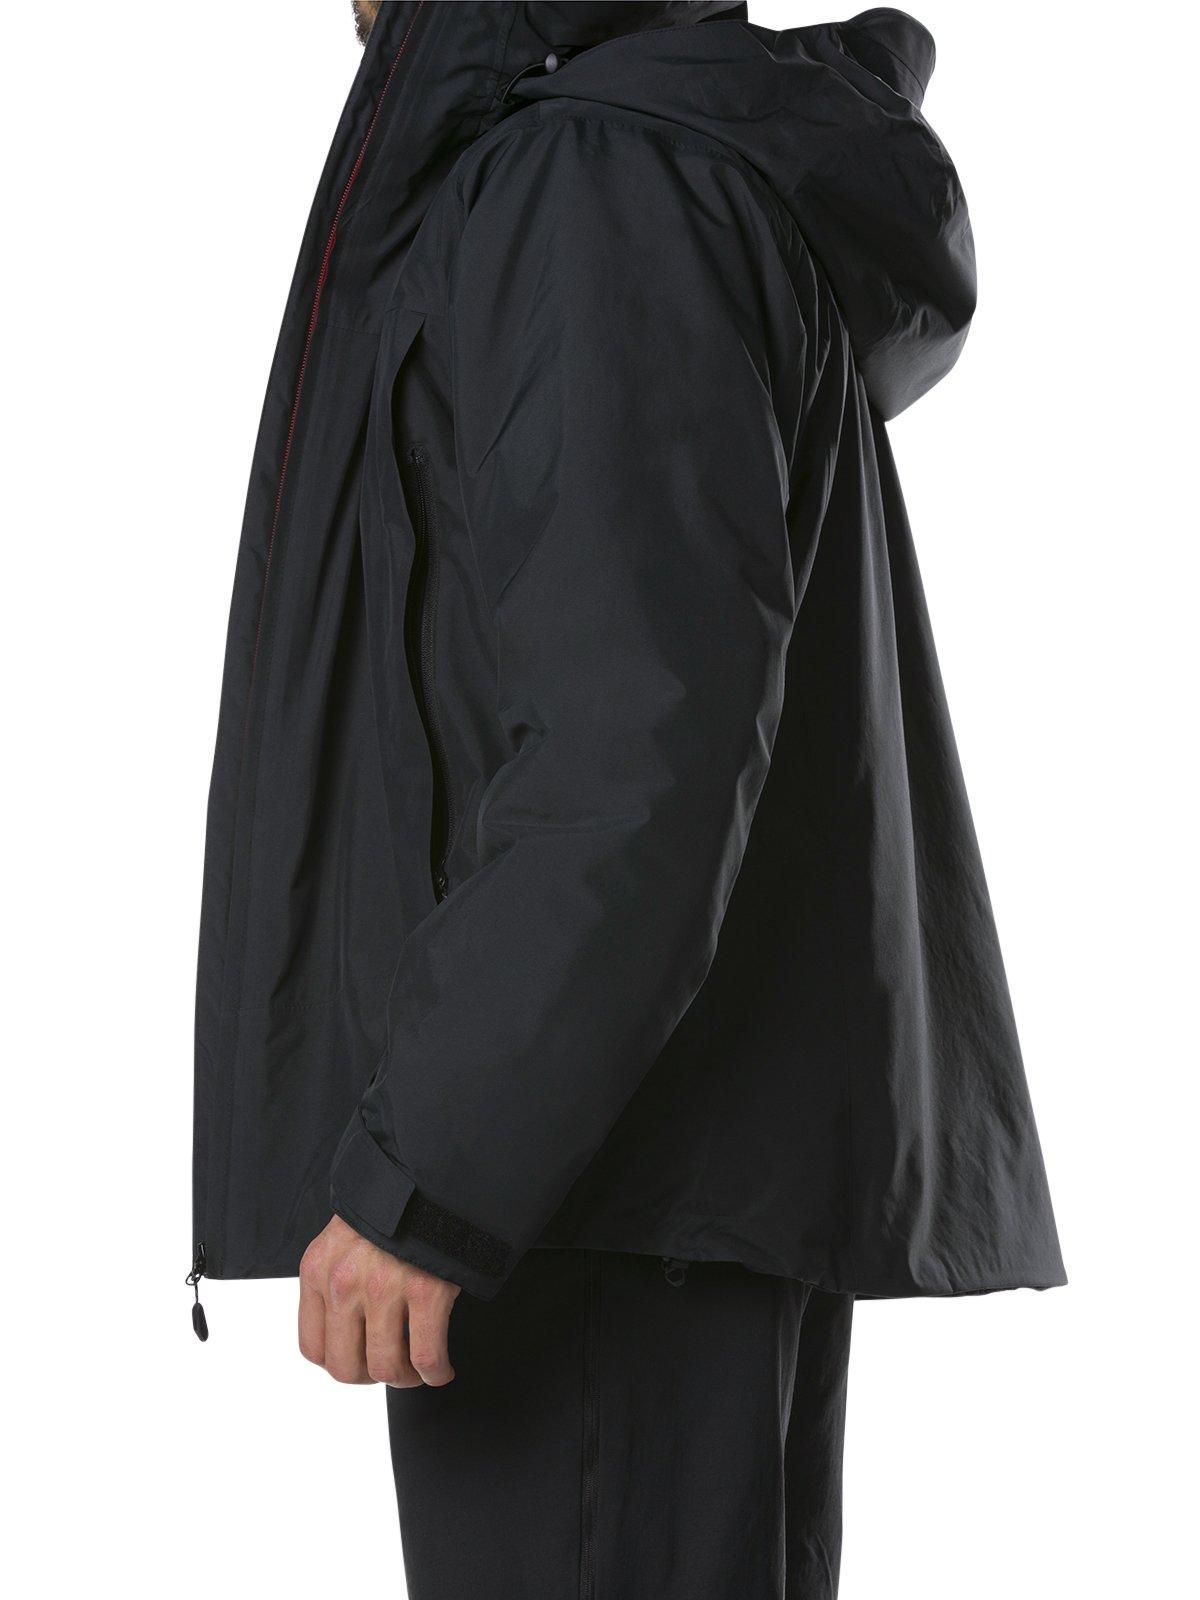 61etzja7ceL - Berghaus Men's Helionik Loft Gore-Tex Waterproof Jacket